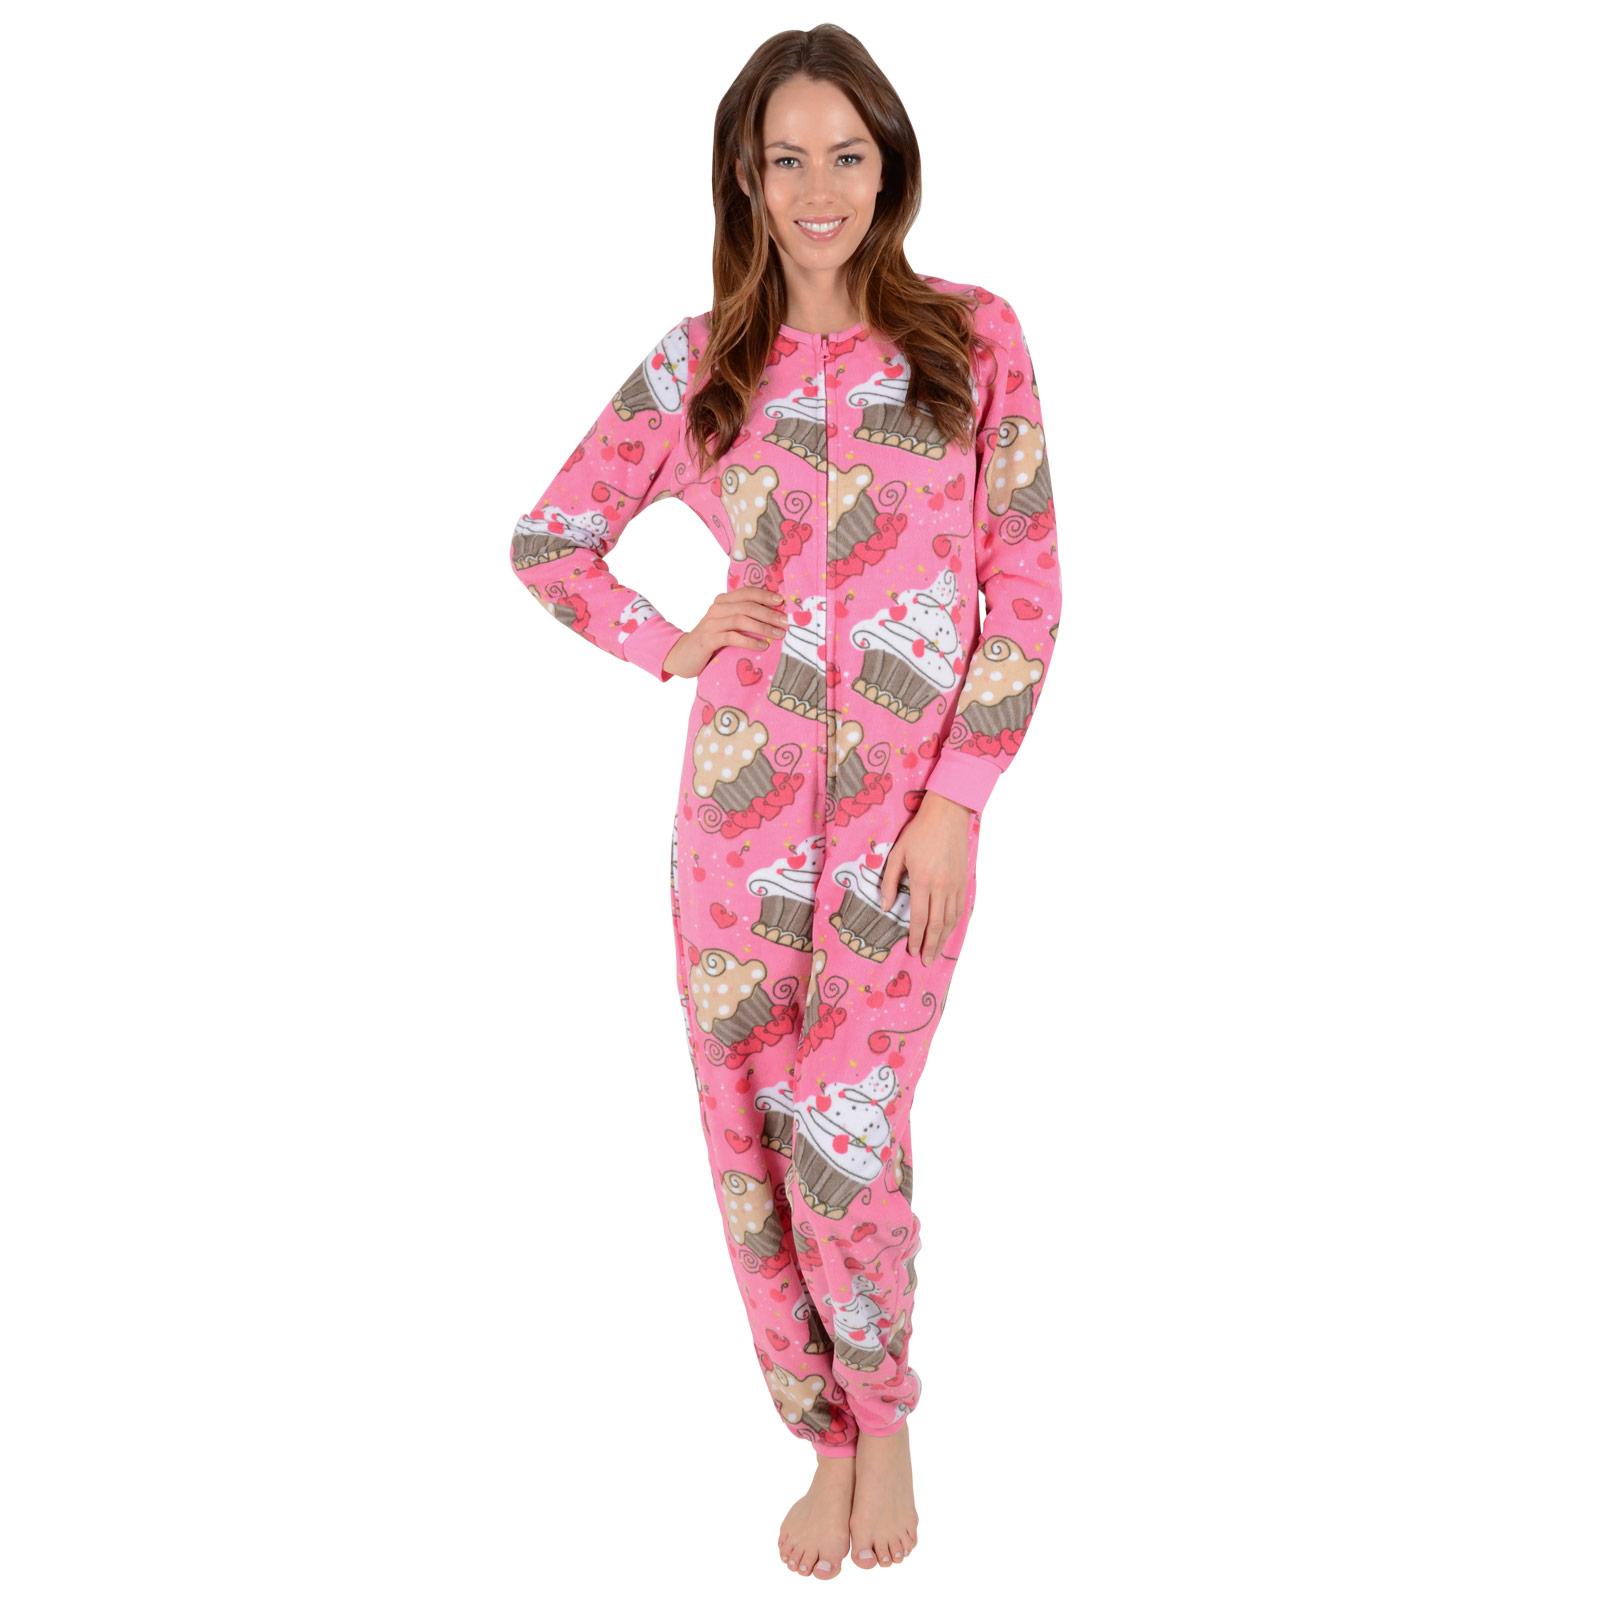 DarkCom Adult All In One Sleepsuit Unisex Cartoon Pajamas Halloween Cosplay Apparel Jumpsuits Hedgehog £ Lora Dora Childrens Kids Tweens Soft Fleece Hooded All .